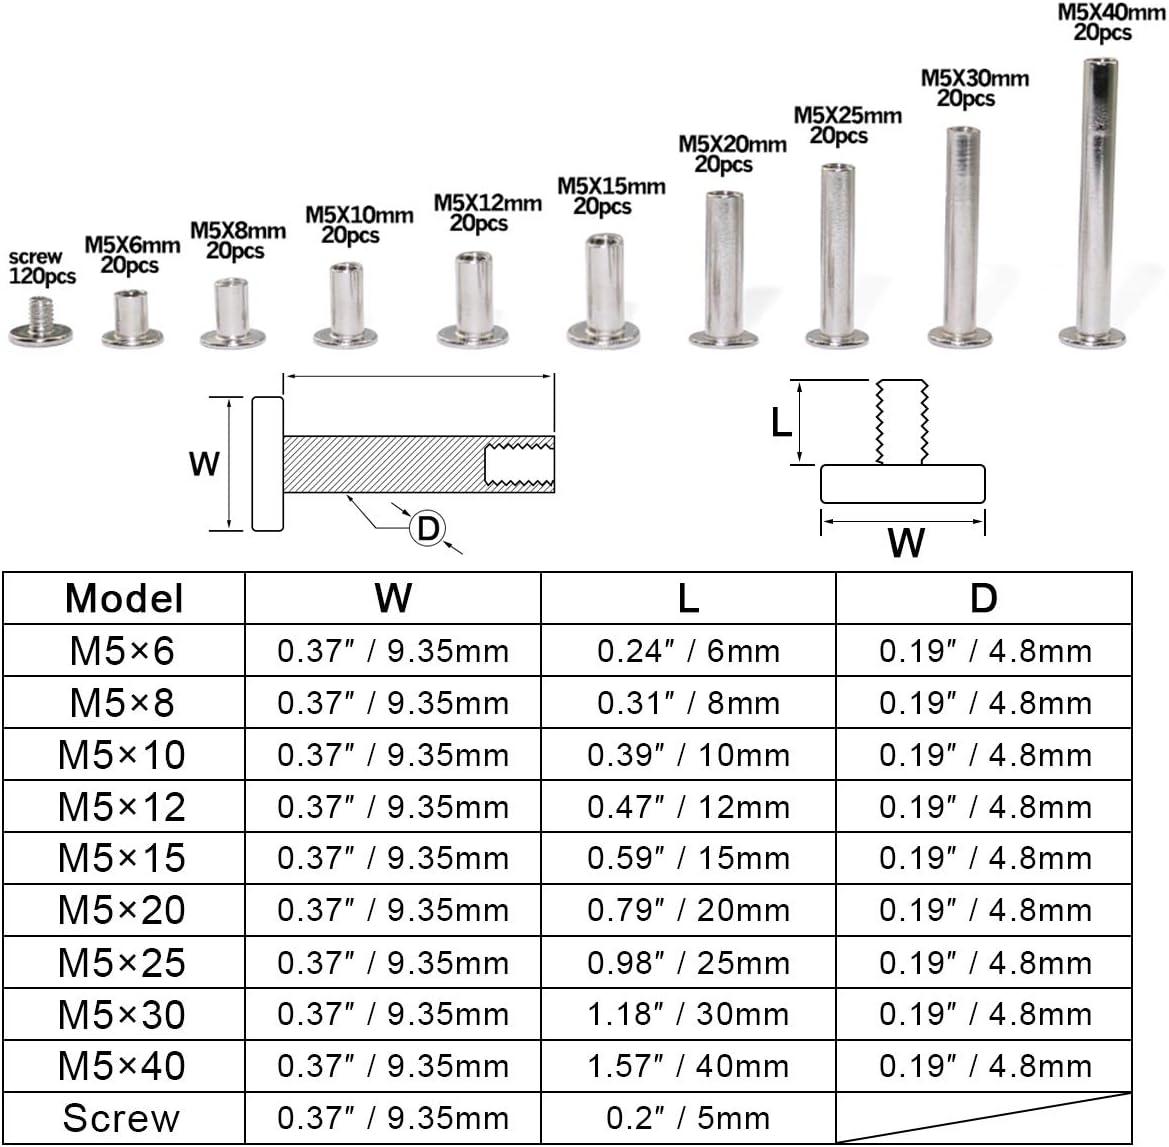 M515(20pcs) 20Pcs Nickle Plated Snap Rivet Binding Screw for Book Butt Photo Album M515 Practical